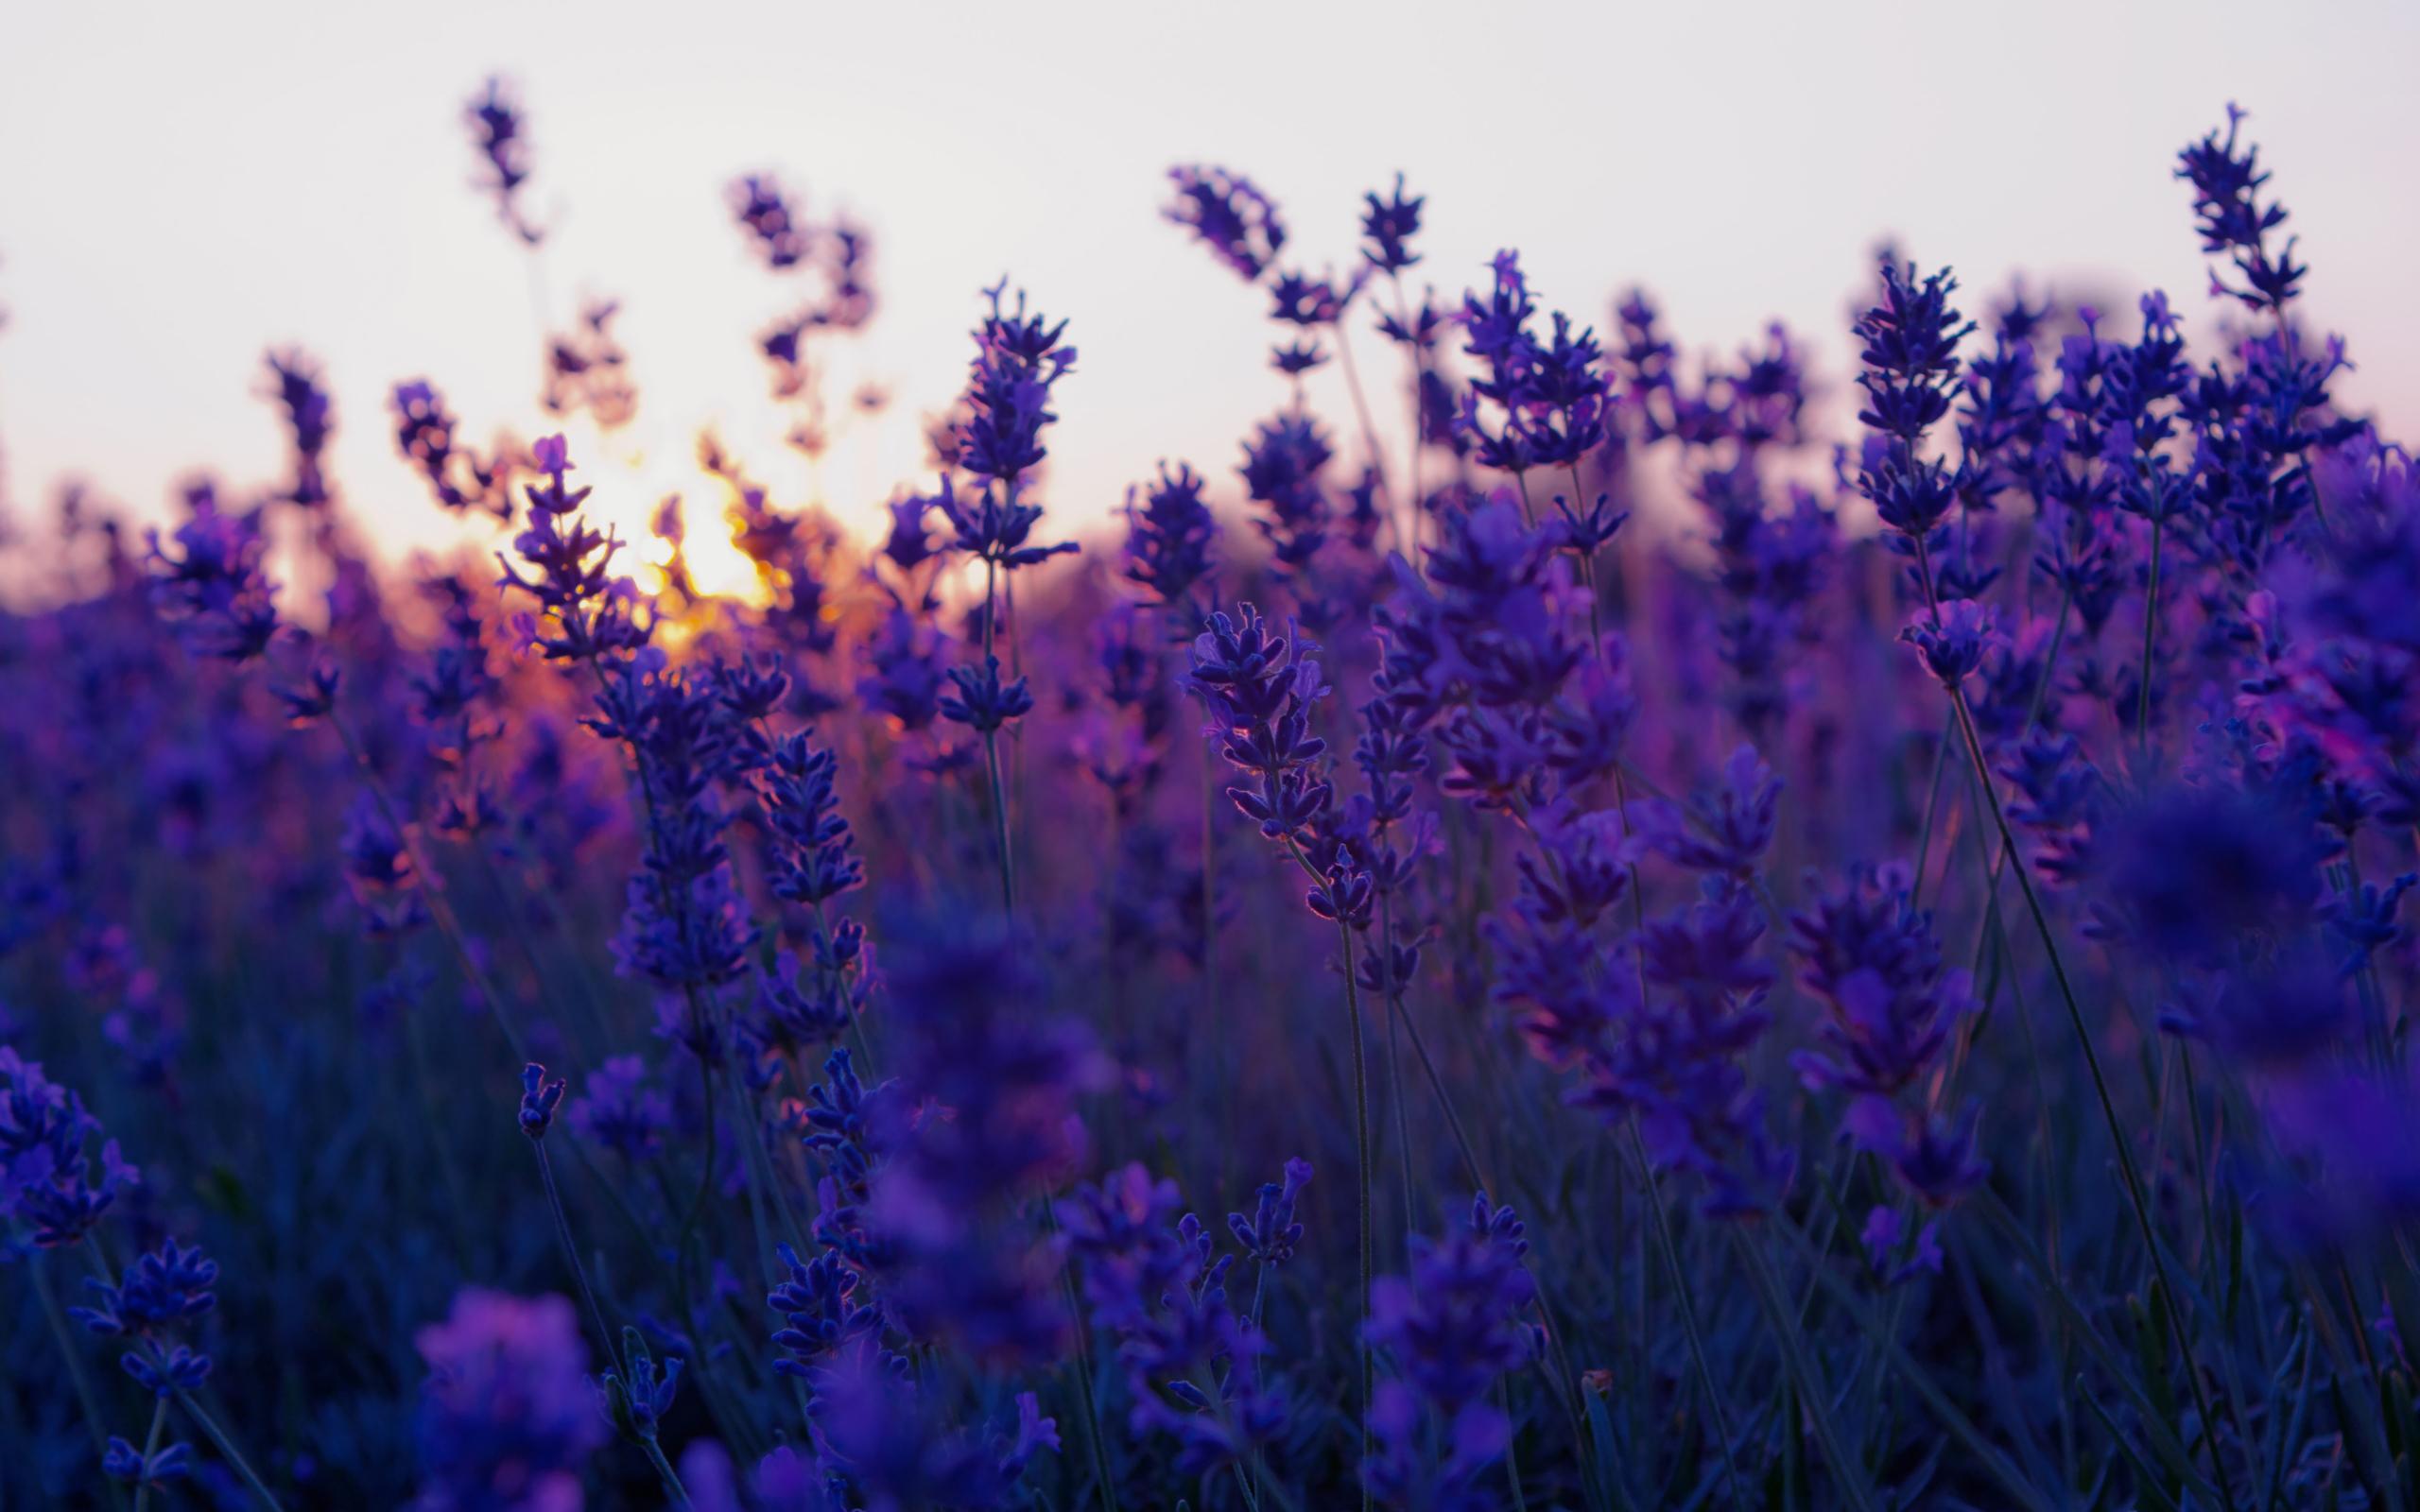 lavender background wallpaper - HD1680×1050